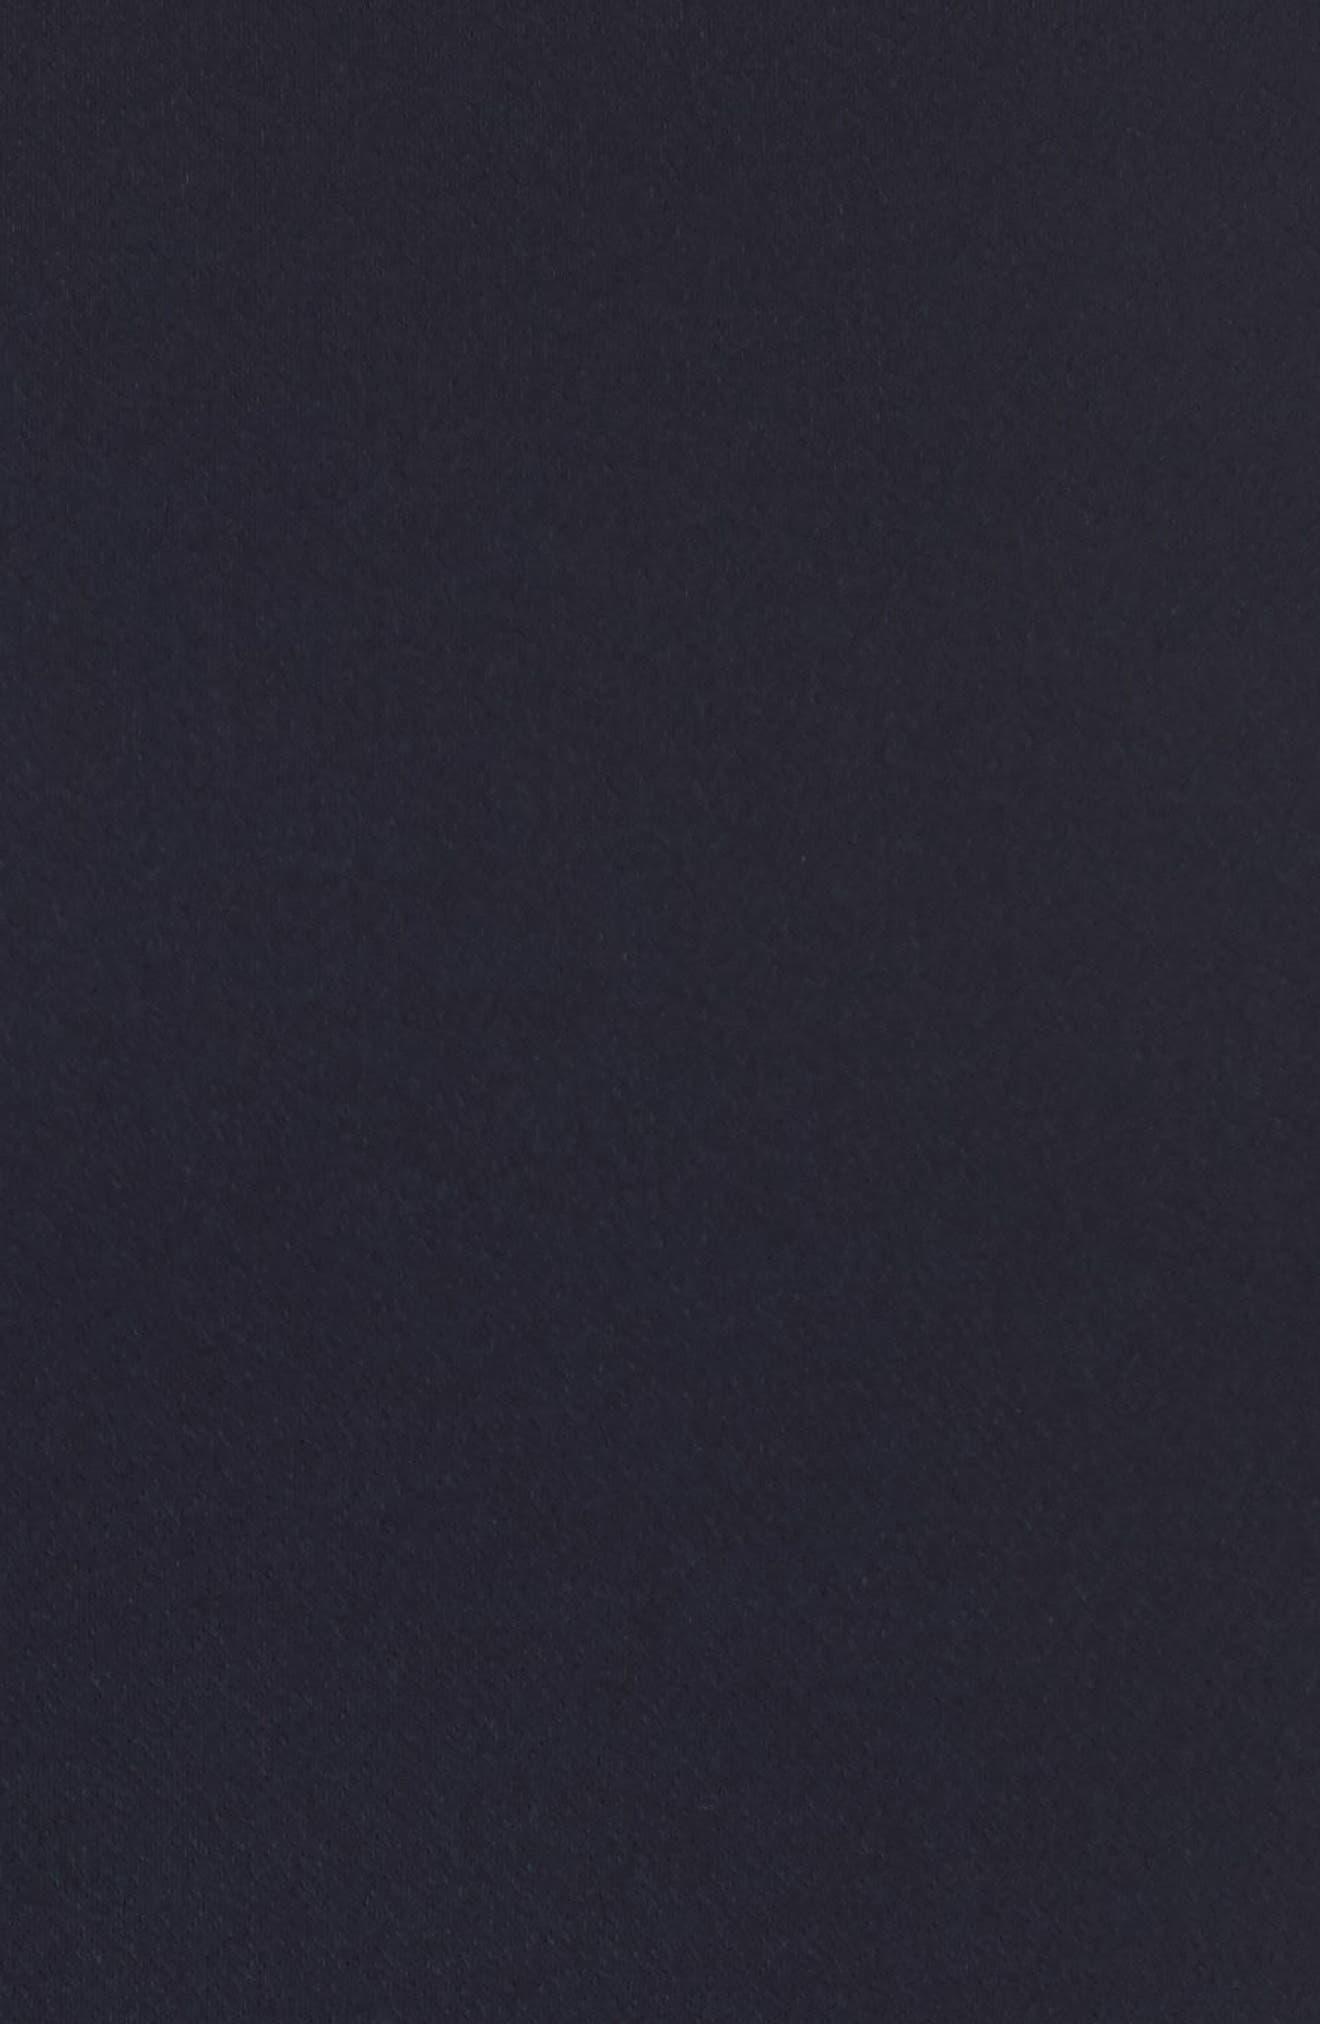 Bow Sleeve Chiffon Shift Dress,                             Alternate thumbnail 5, color,                             410